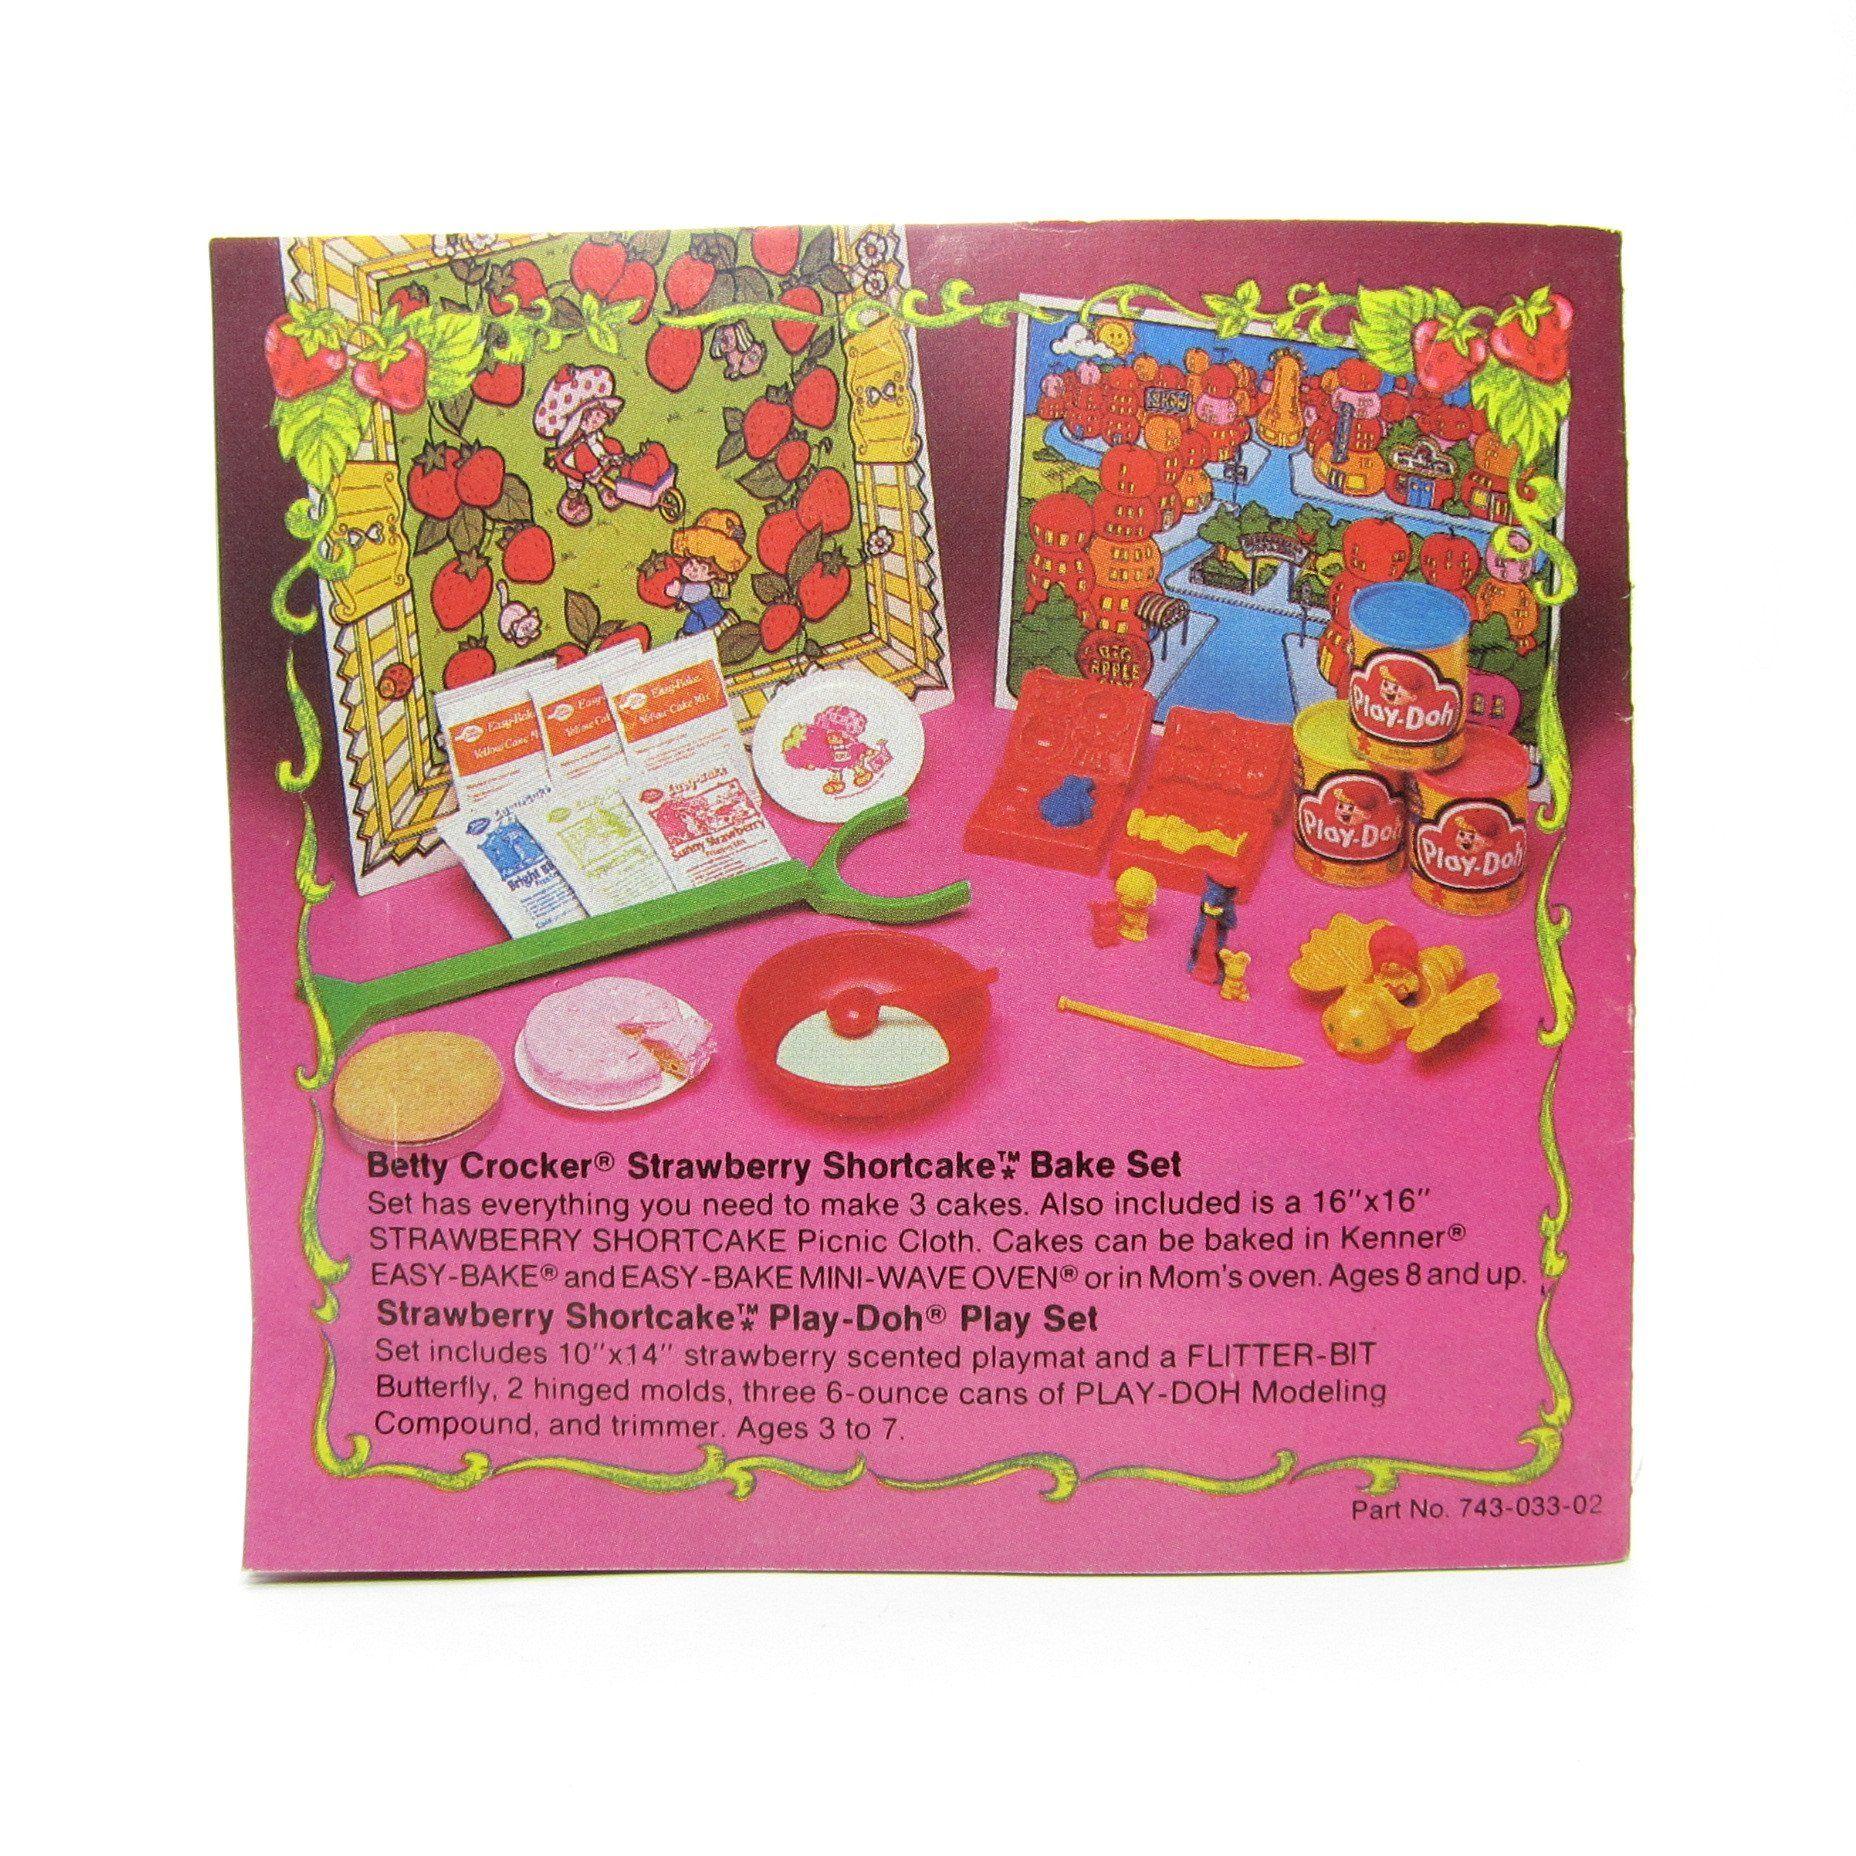 strawberry shortcake pamphlet vintage advertising toy brochure